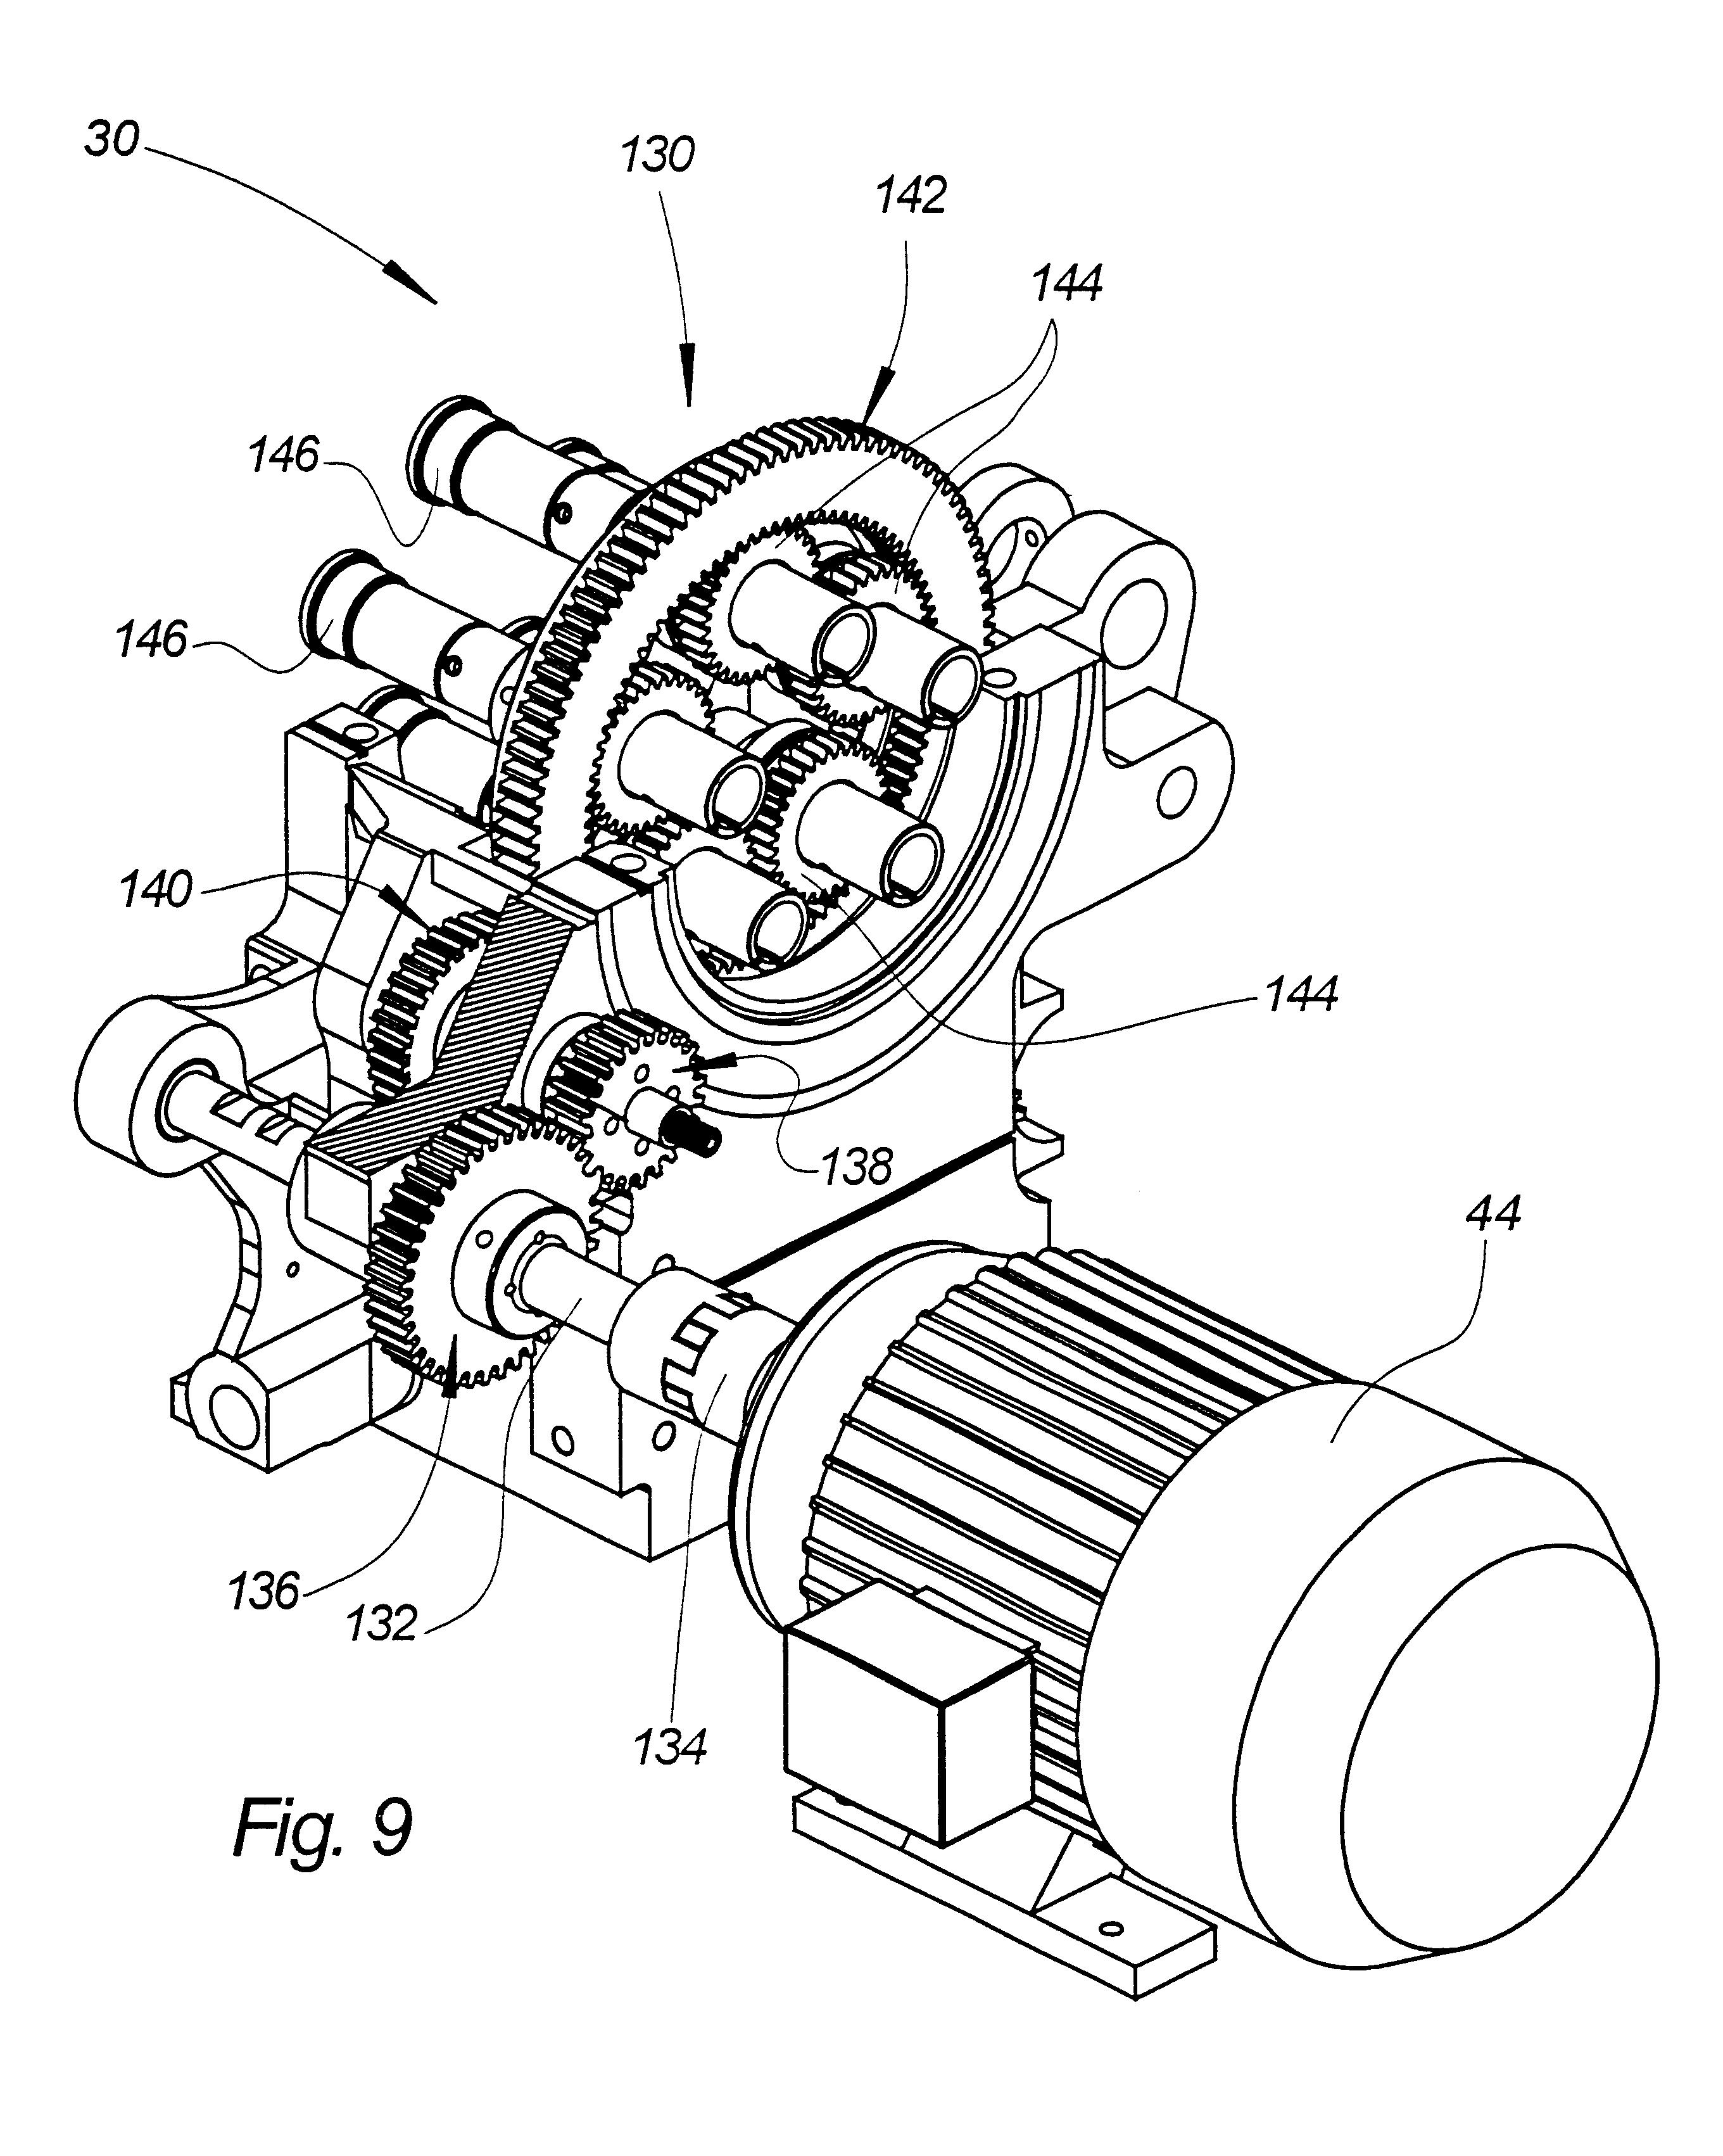 patent us6263553 machine tool with servo drive mechanism RC Linear Servo Motor patent drawing